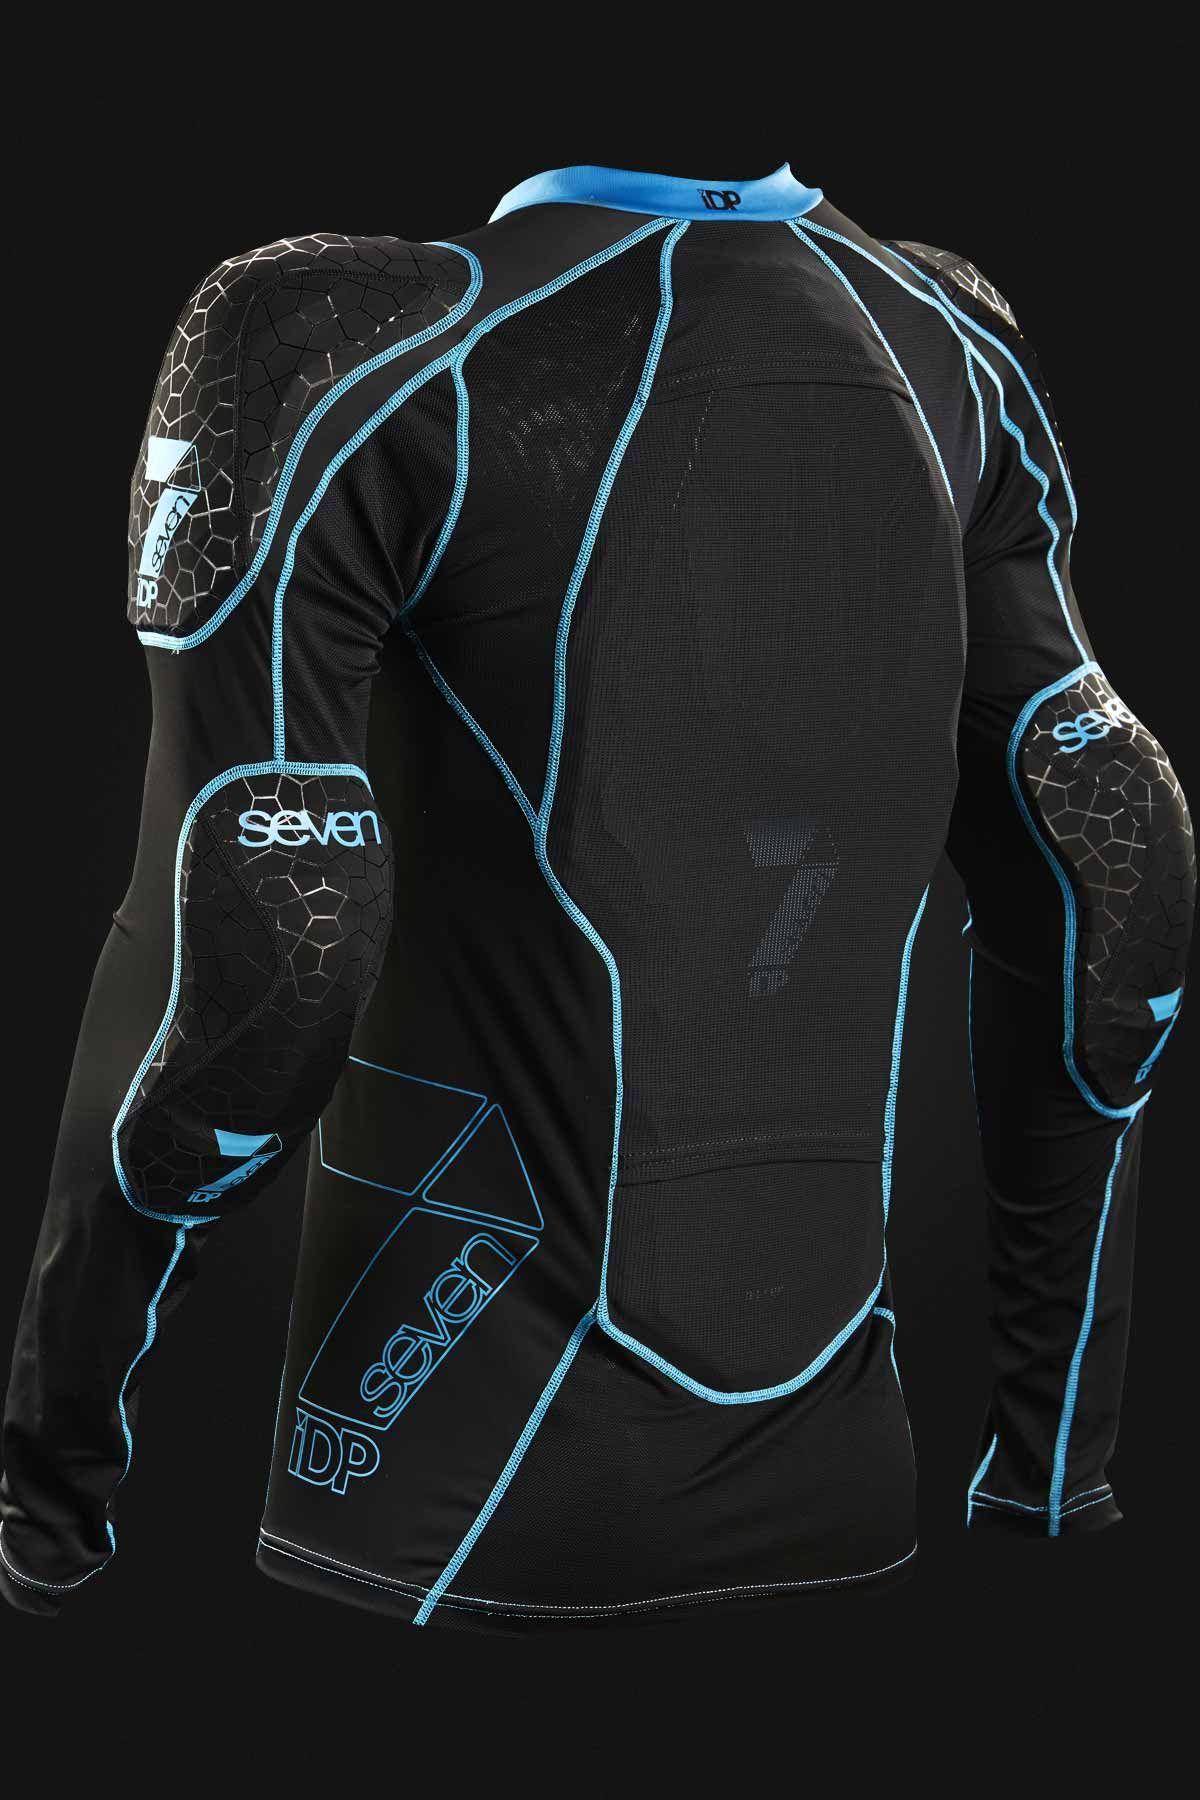 Transition Long Sleeve Base Suit Suits, Puma jacket